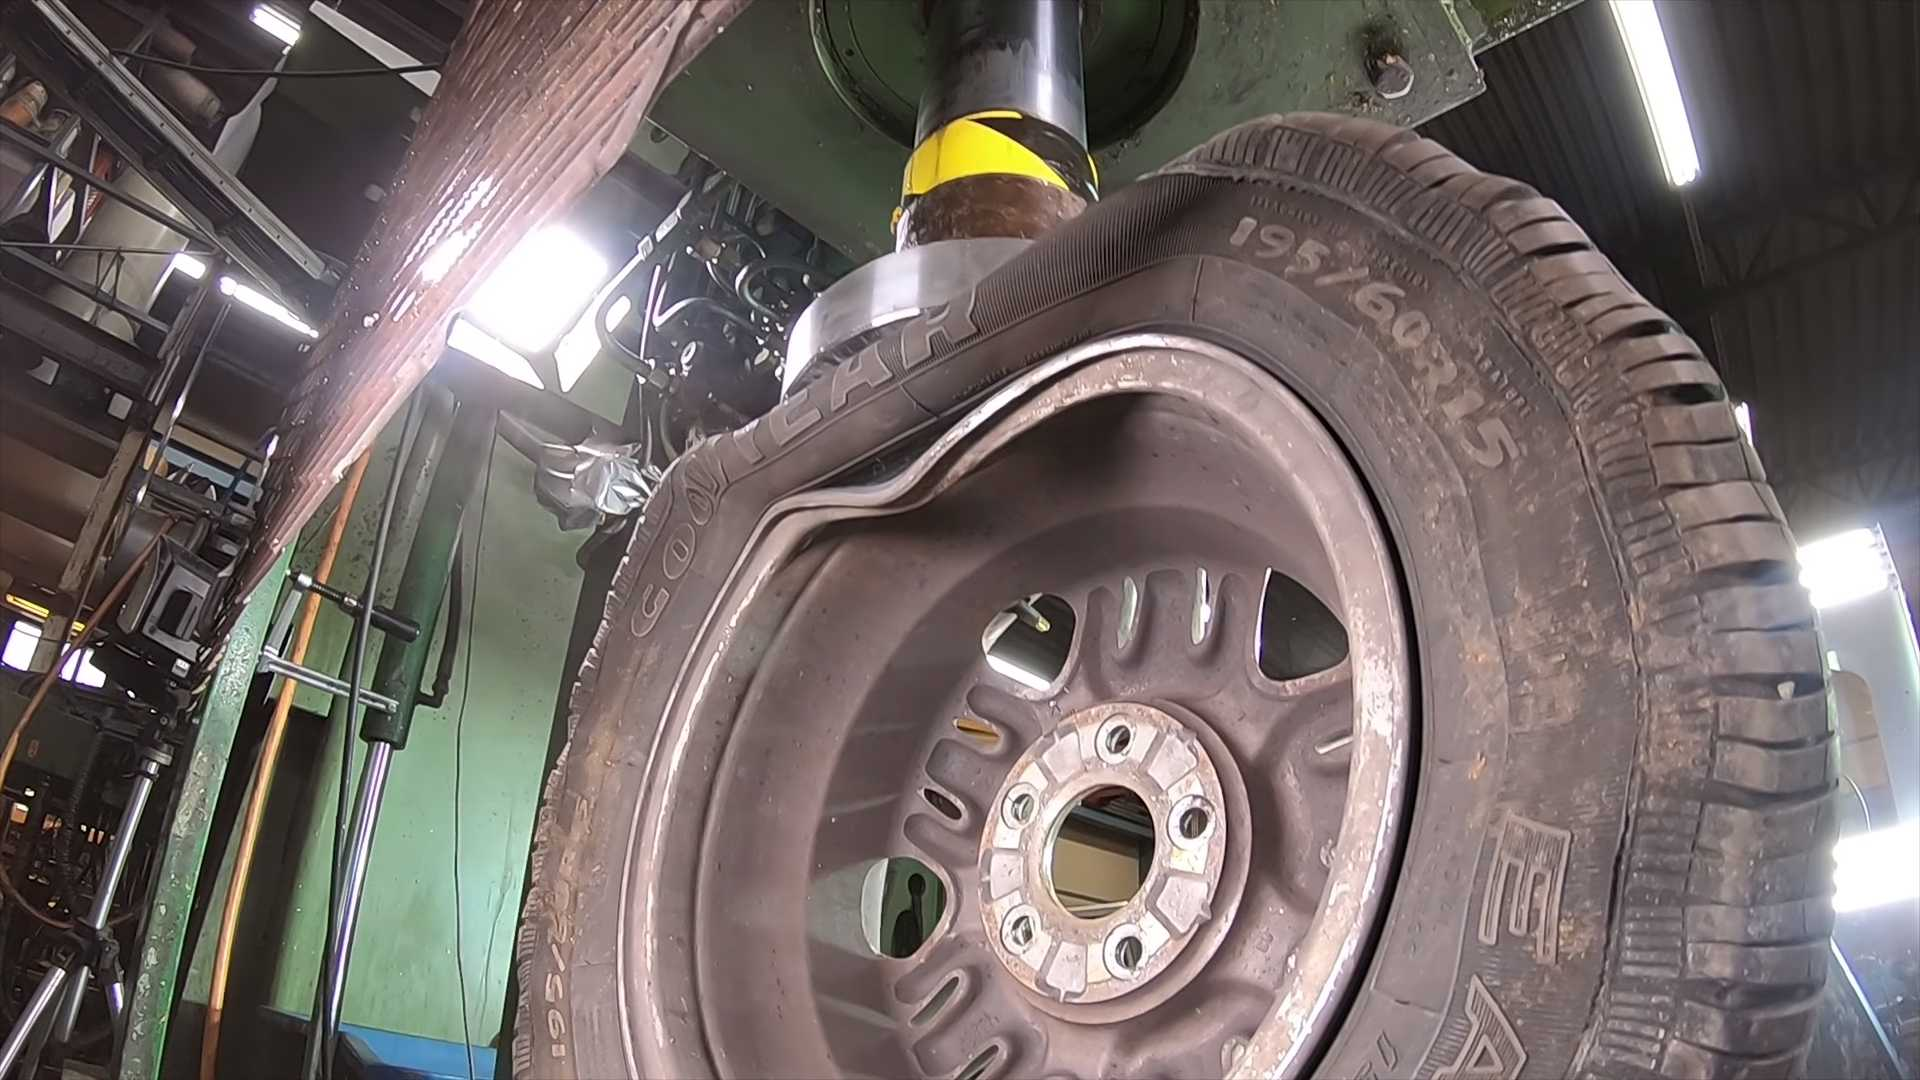 wheel-crushed-in-hydraulic-press-4 Ce fel de roata este mai rezistenta? Janta de otel vs janta de aliaj